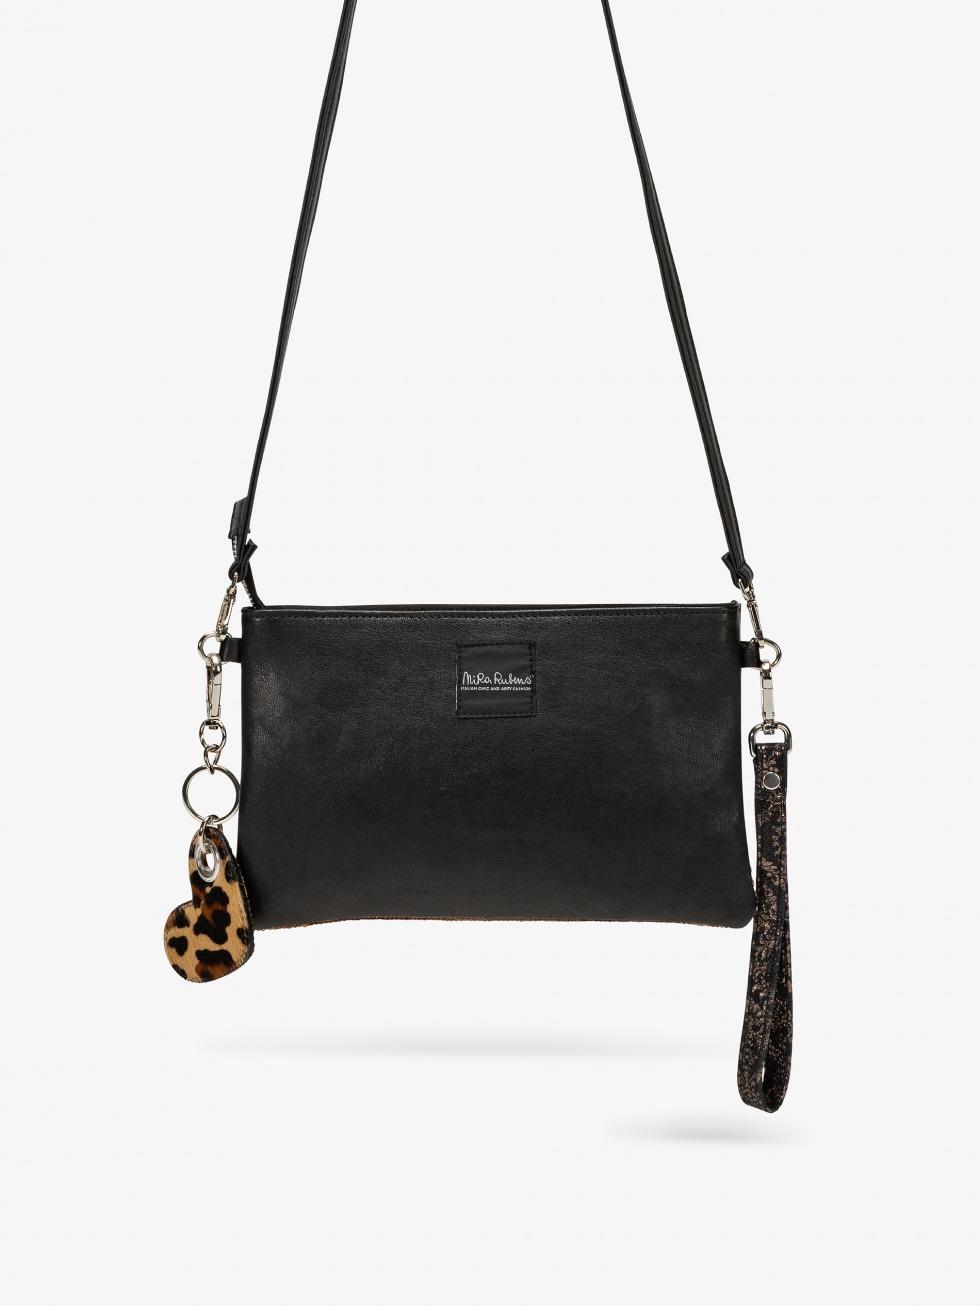 Minibag - Black Gold